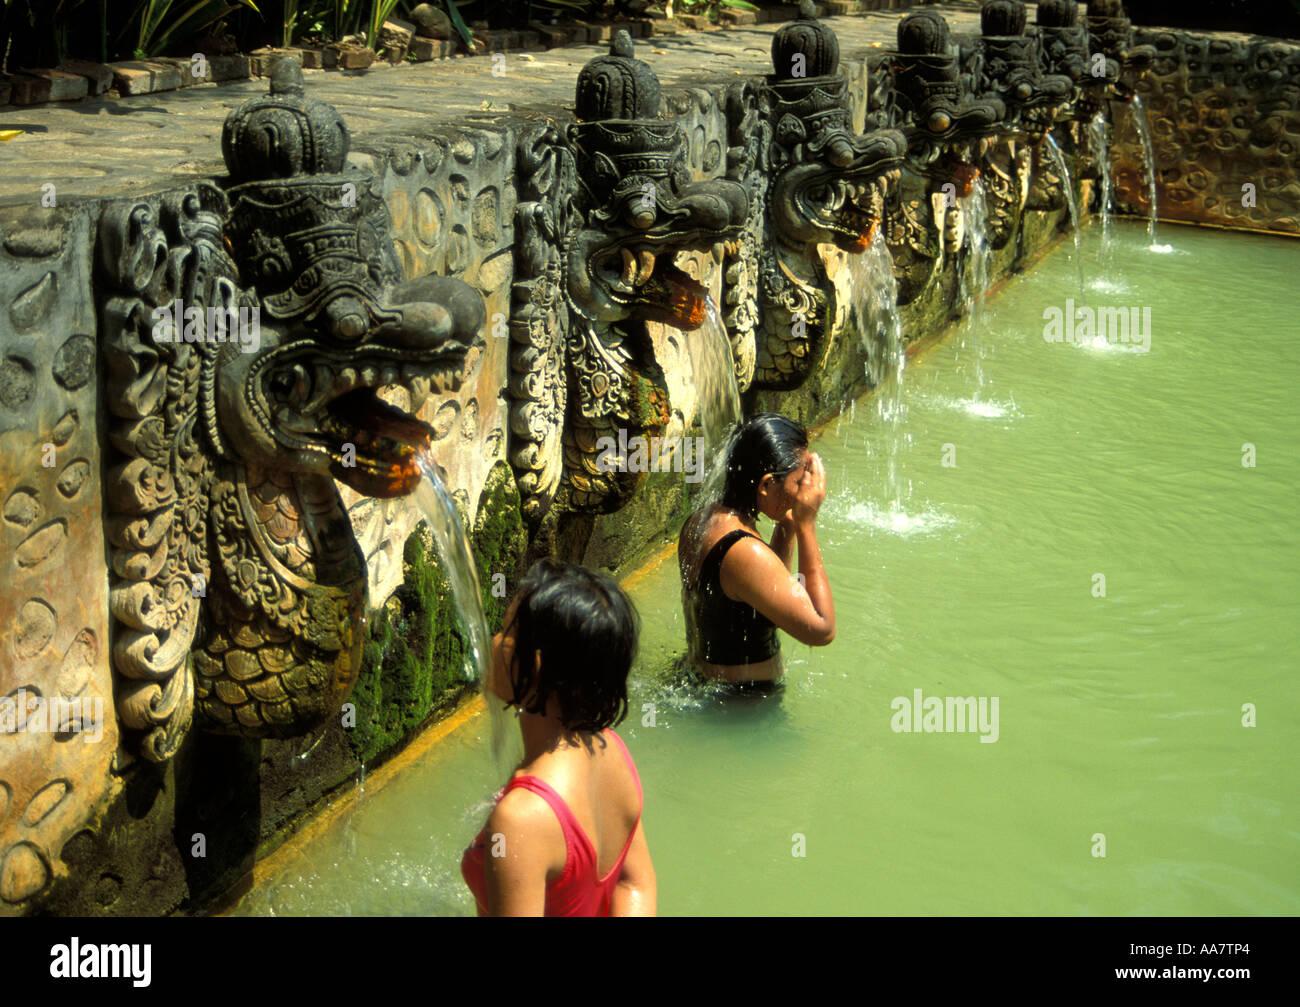 Hot Scene Bali Women 77